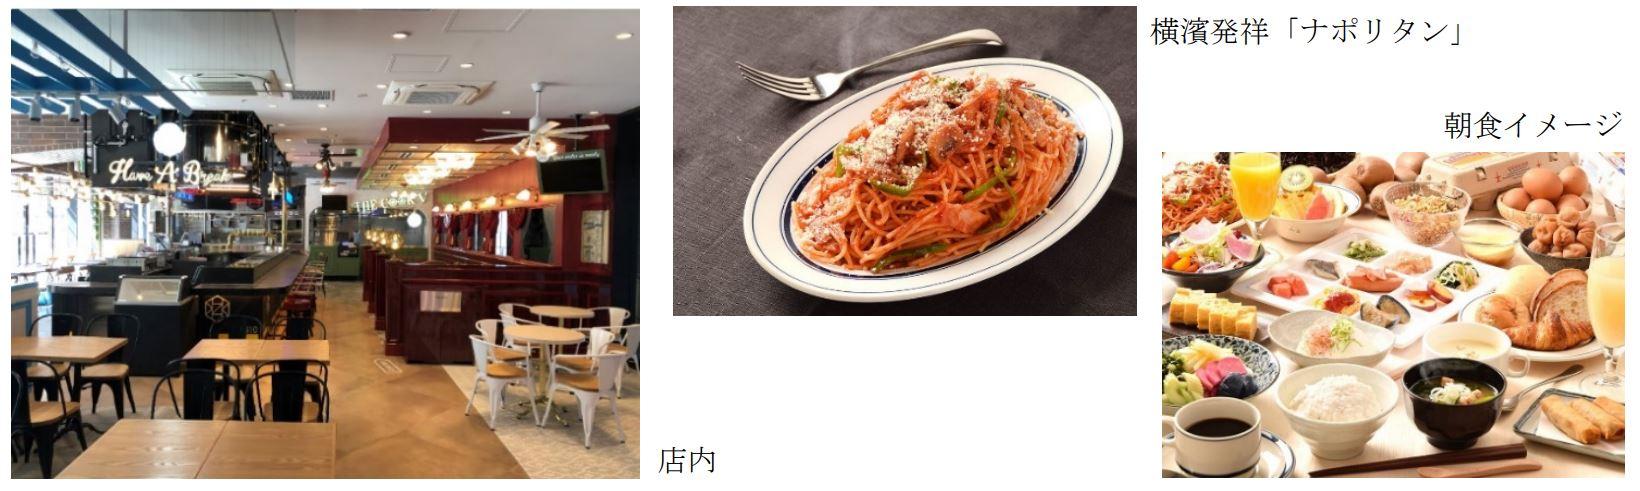 JR東日本ホテルメッツ 横浜桜木町のフードホールKITEKIのイメージ写真